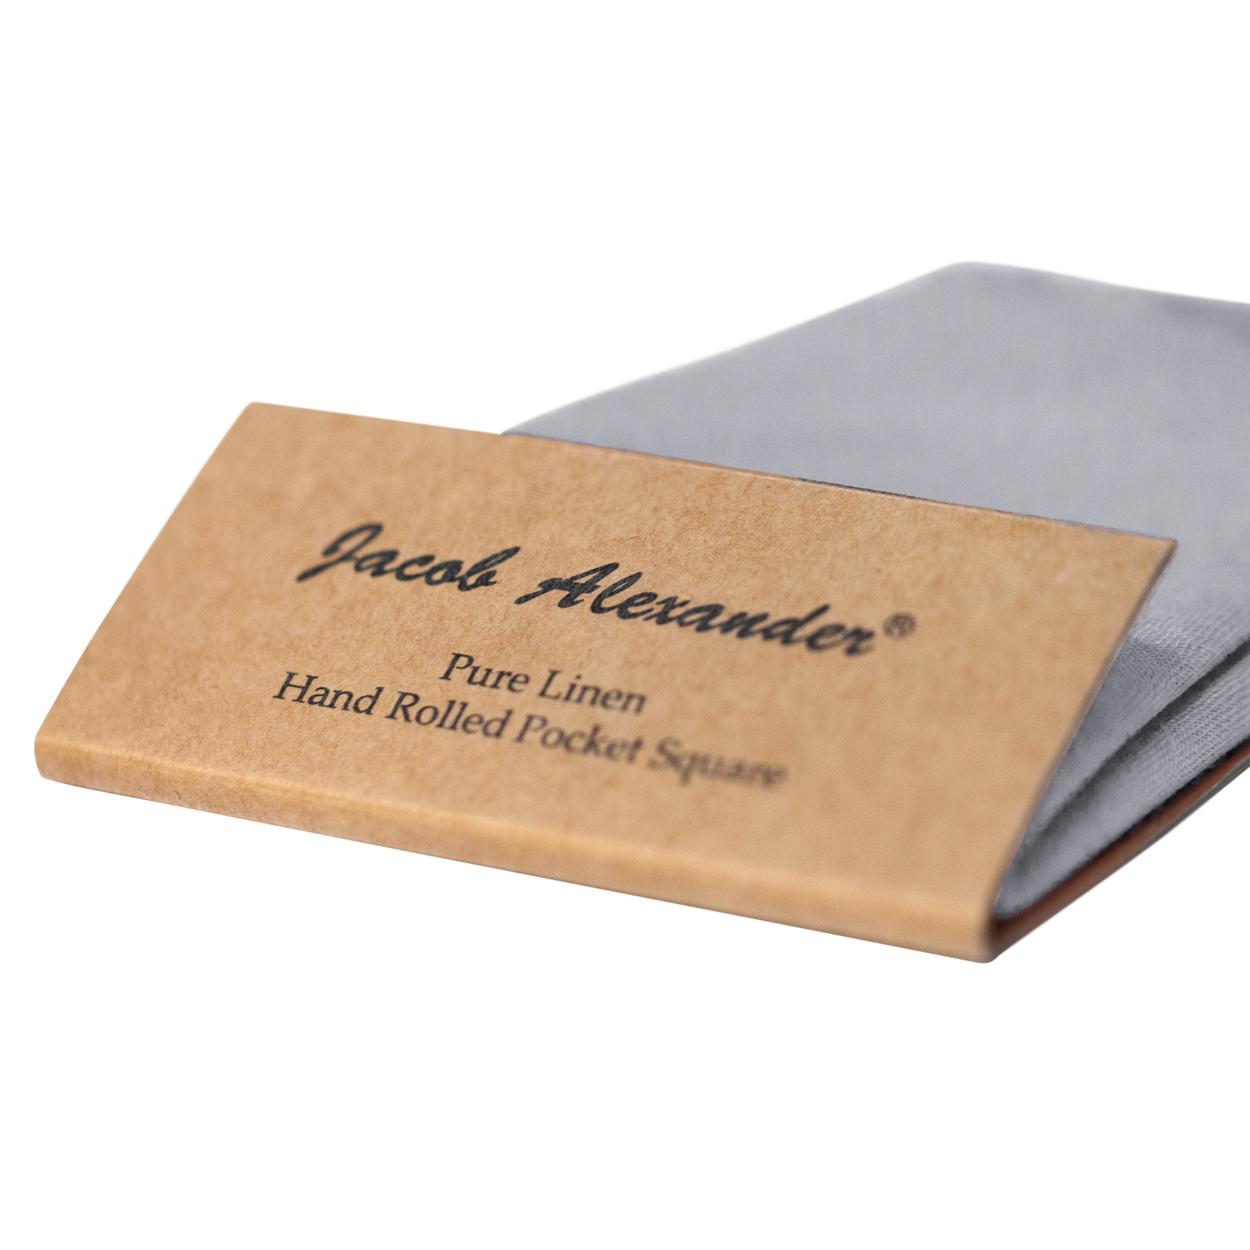 Jacob-Alexander-Linen-Handrolled-15-034-x-15-034-Pocket-Square-Hanky thumbnail 28